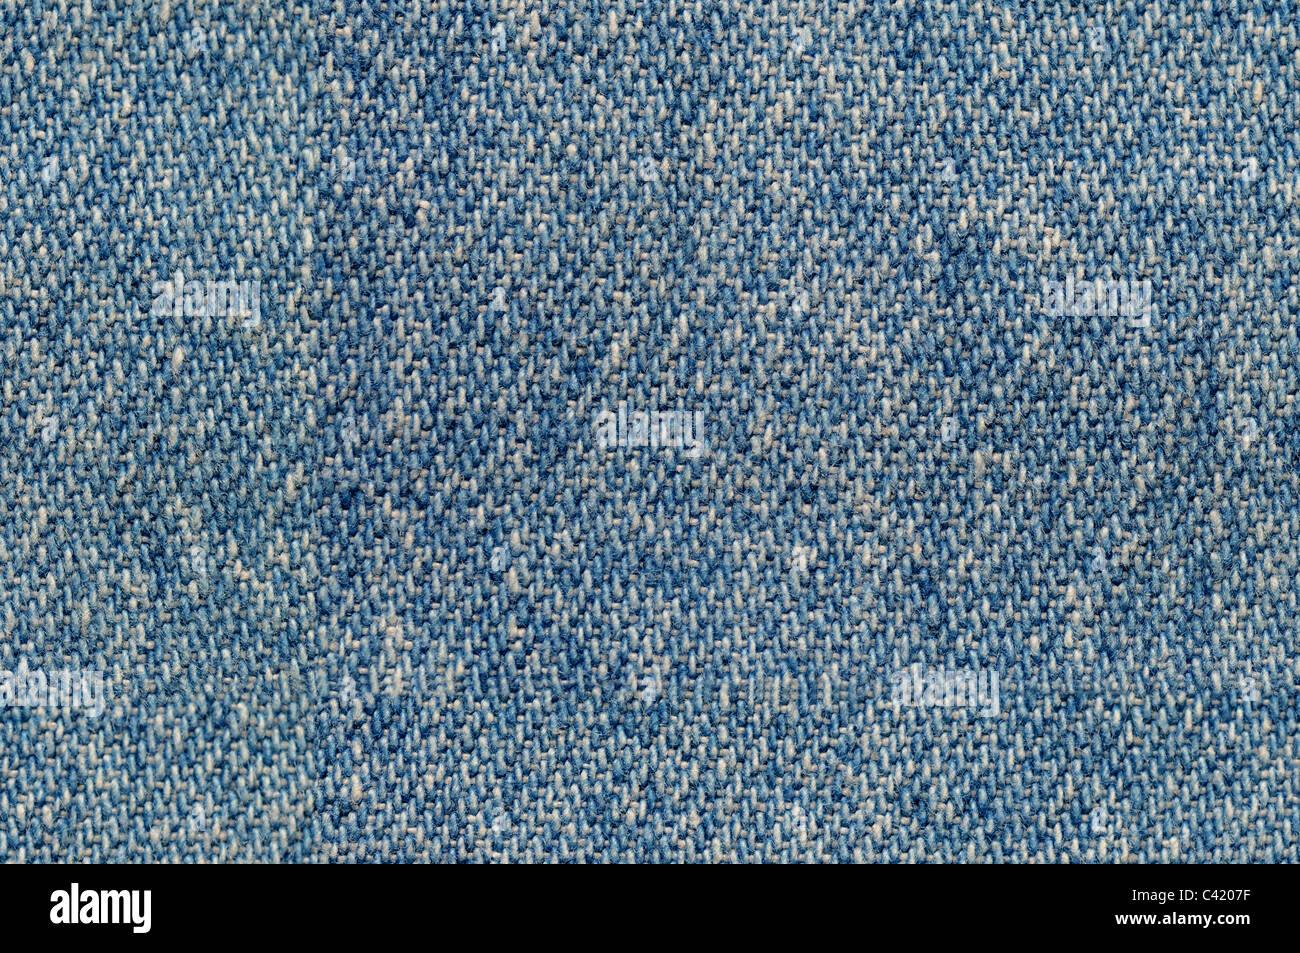 Fond tissu tissu denim bleu parfaitement raccordable Photo Stock